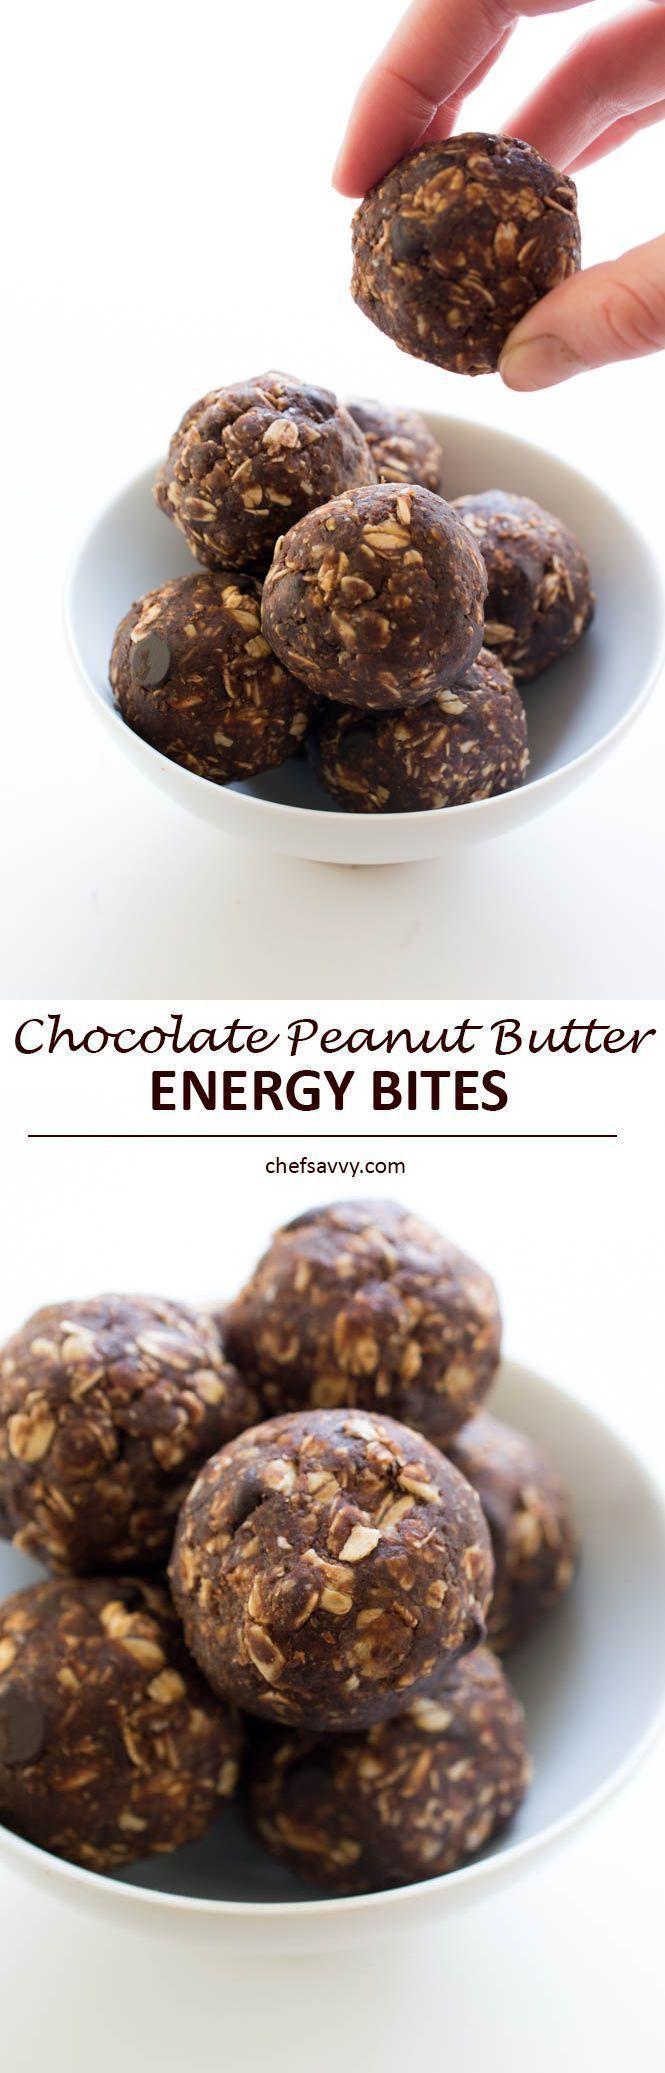 Chocolate Peanut Butter Protein Bites